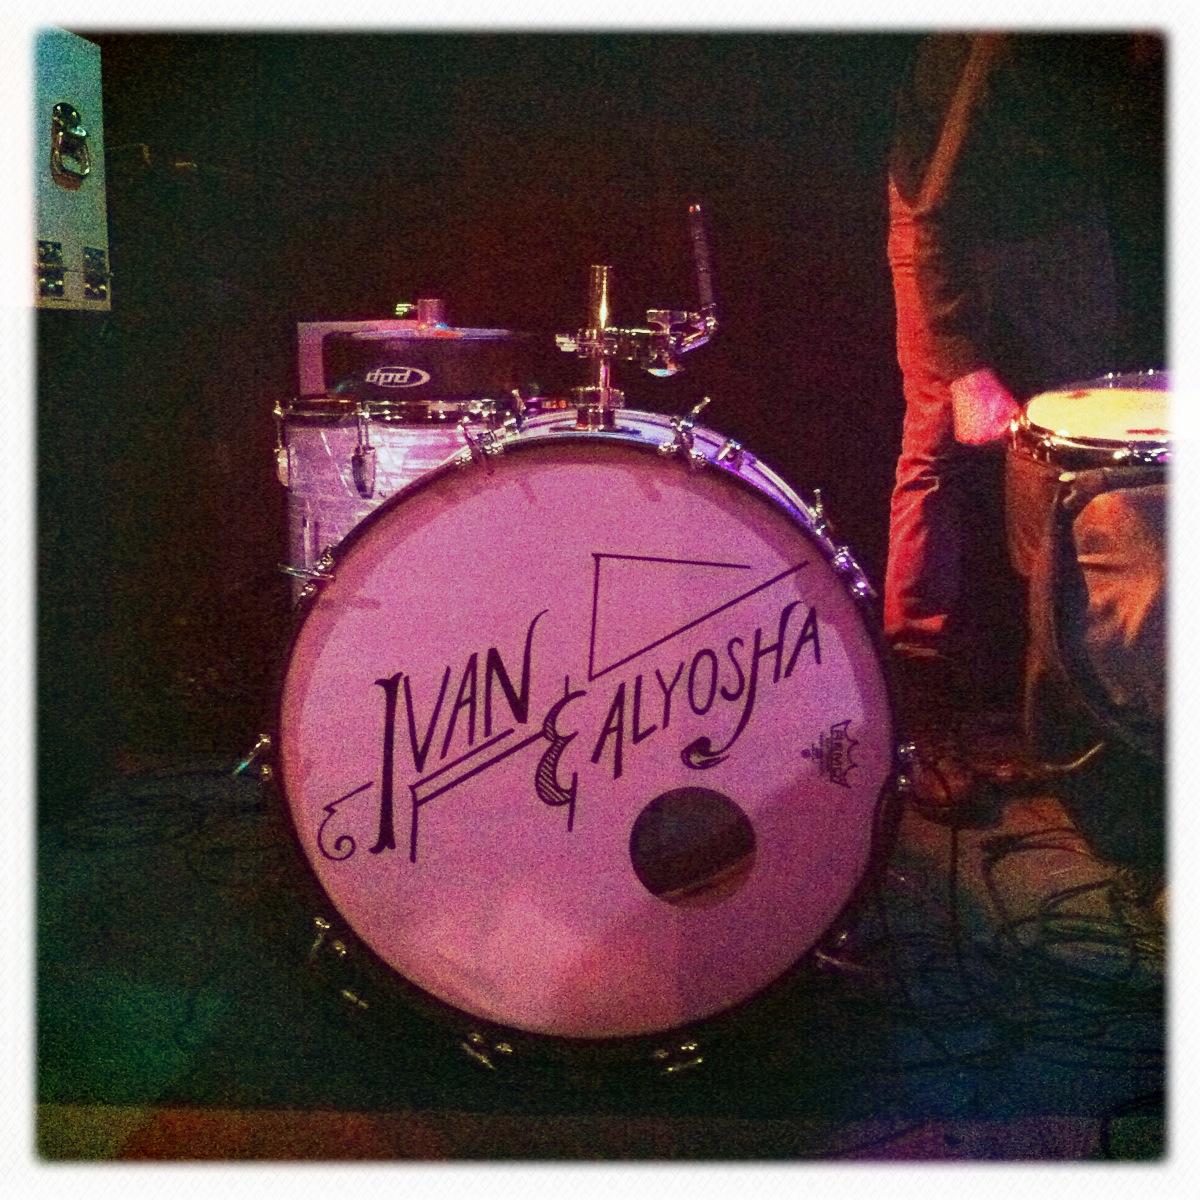 New I&A Drum Head Courtesy Of Our Dear Friend Lauren Mcconaughey!